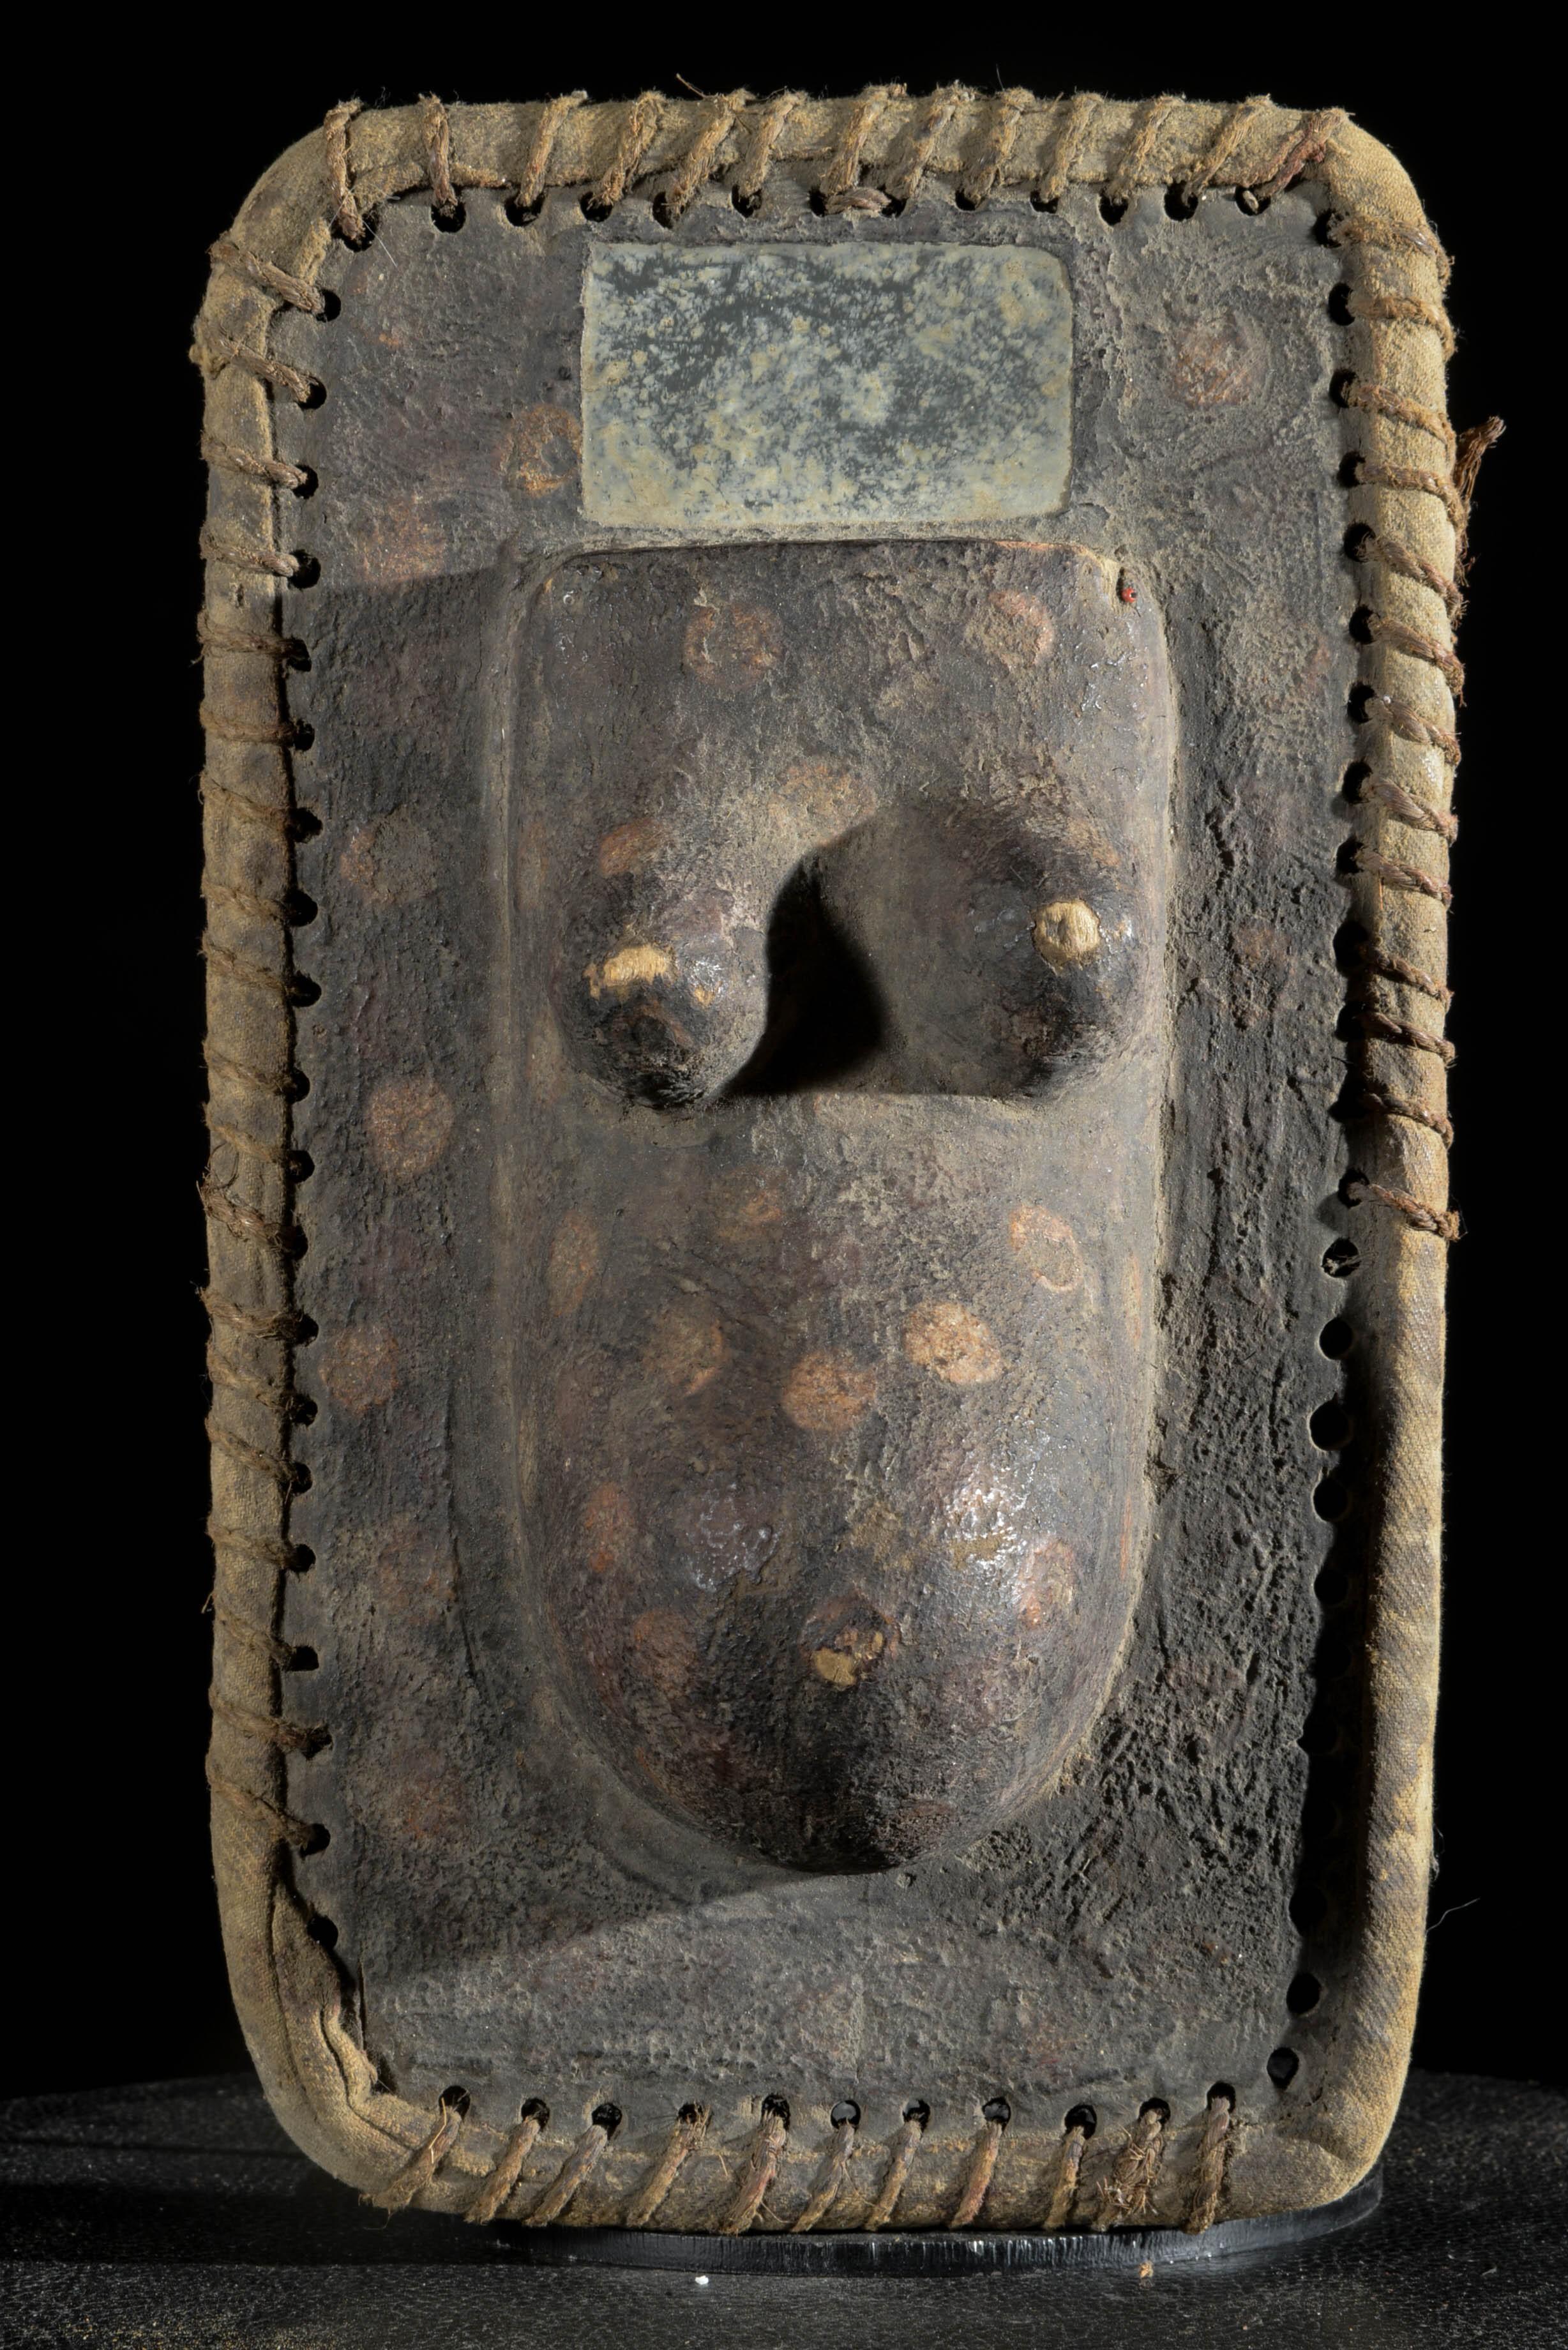 Masque ventre - Salampasu - RDC Zaïre